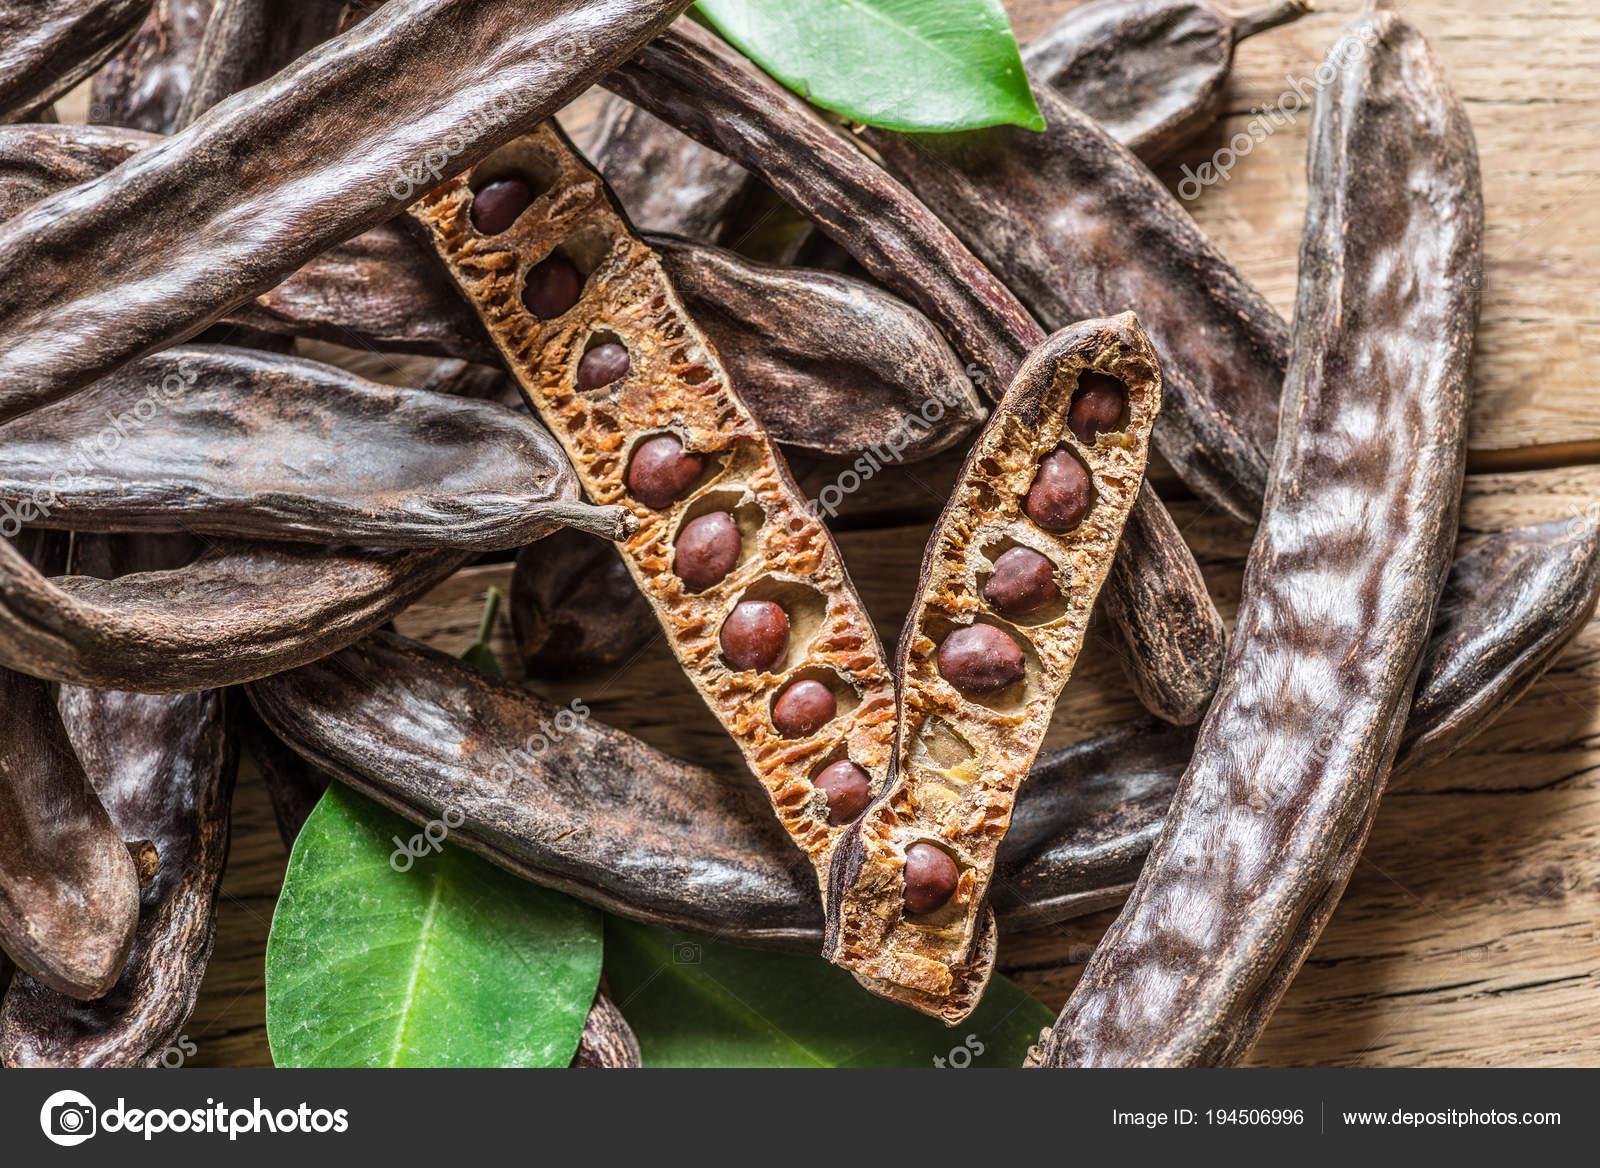 depositphotos_194506996-stock-photo-carob-pods-and-carob-beans.jpg